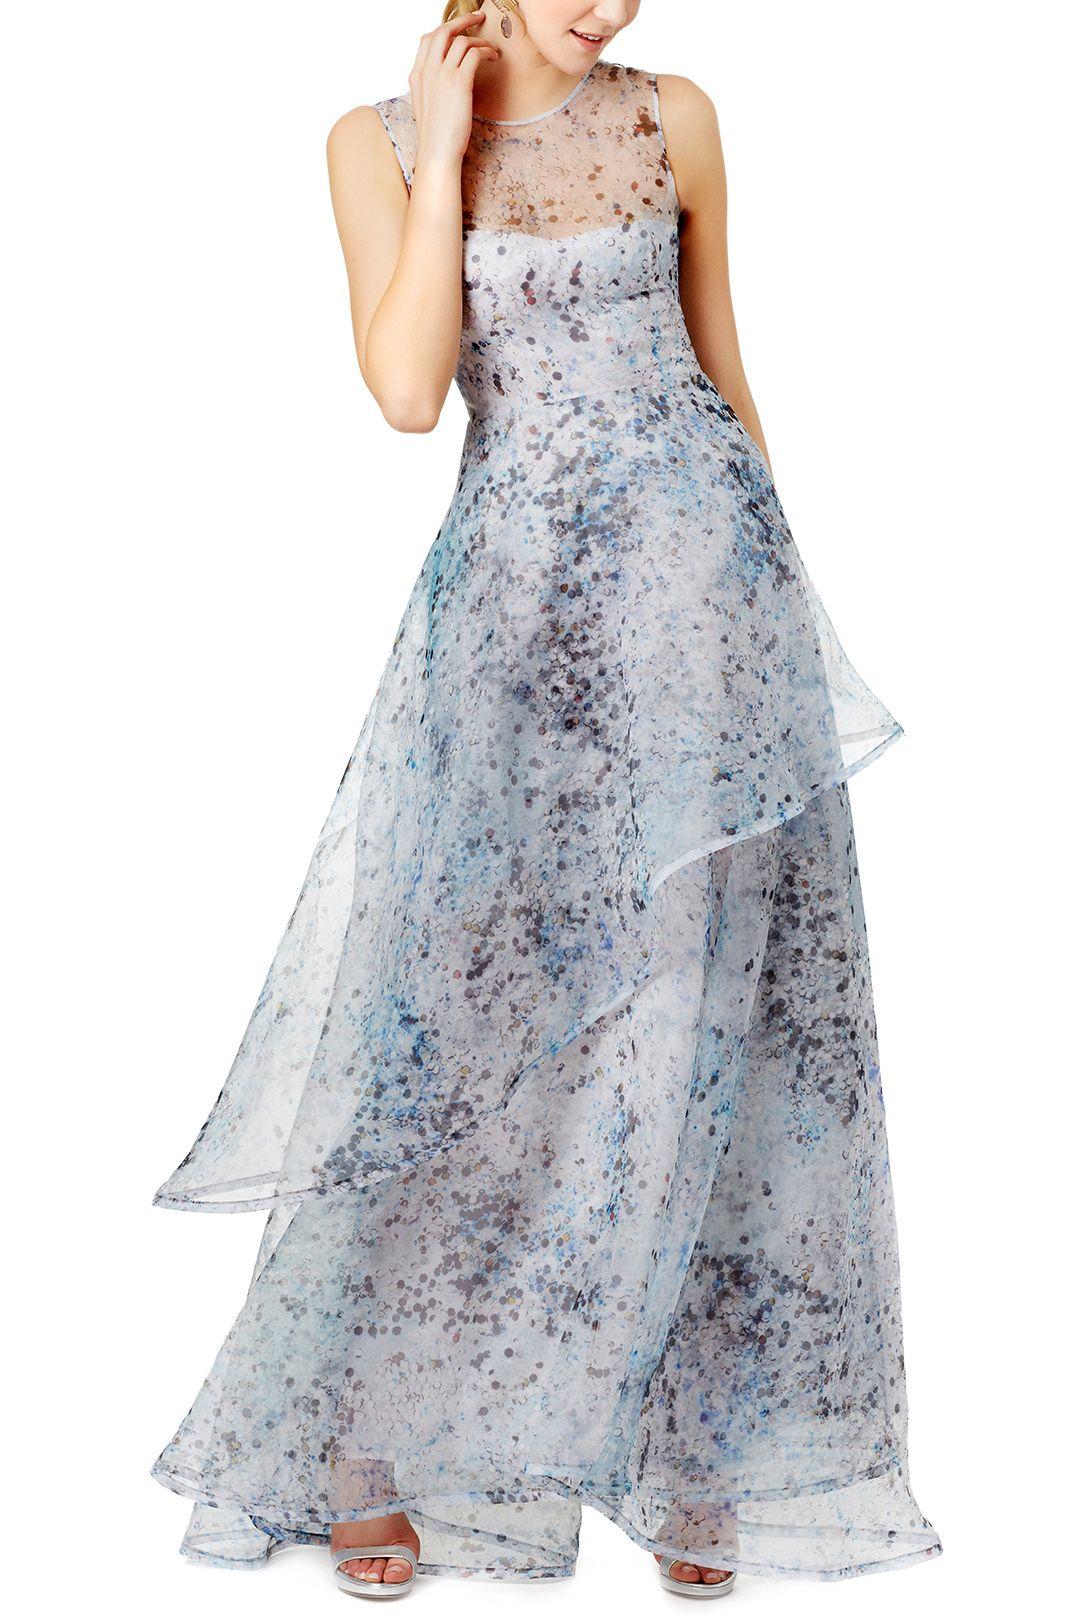 Jaelyn Gown   Nautical wedding, Beach weddings and Bride dresses